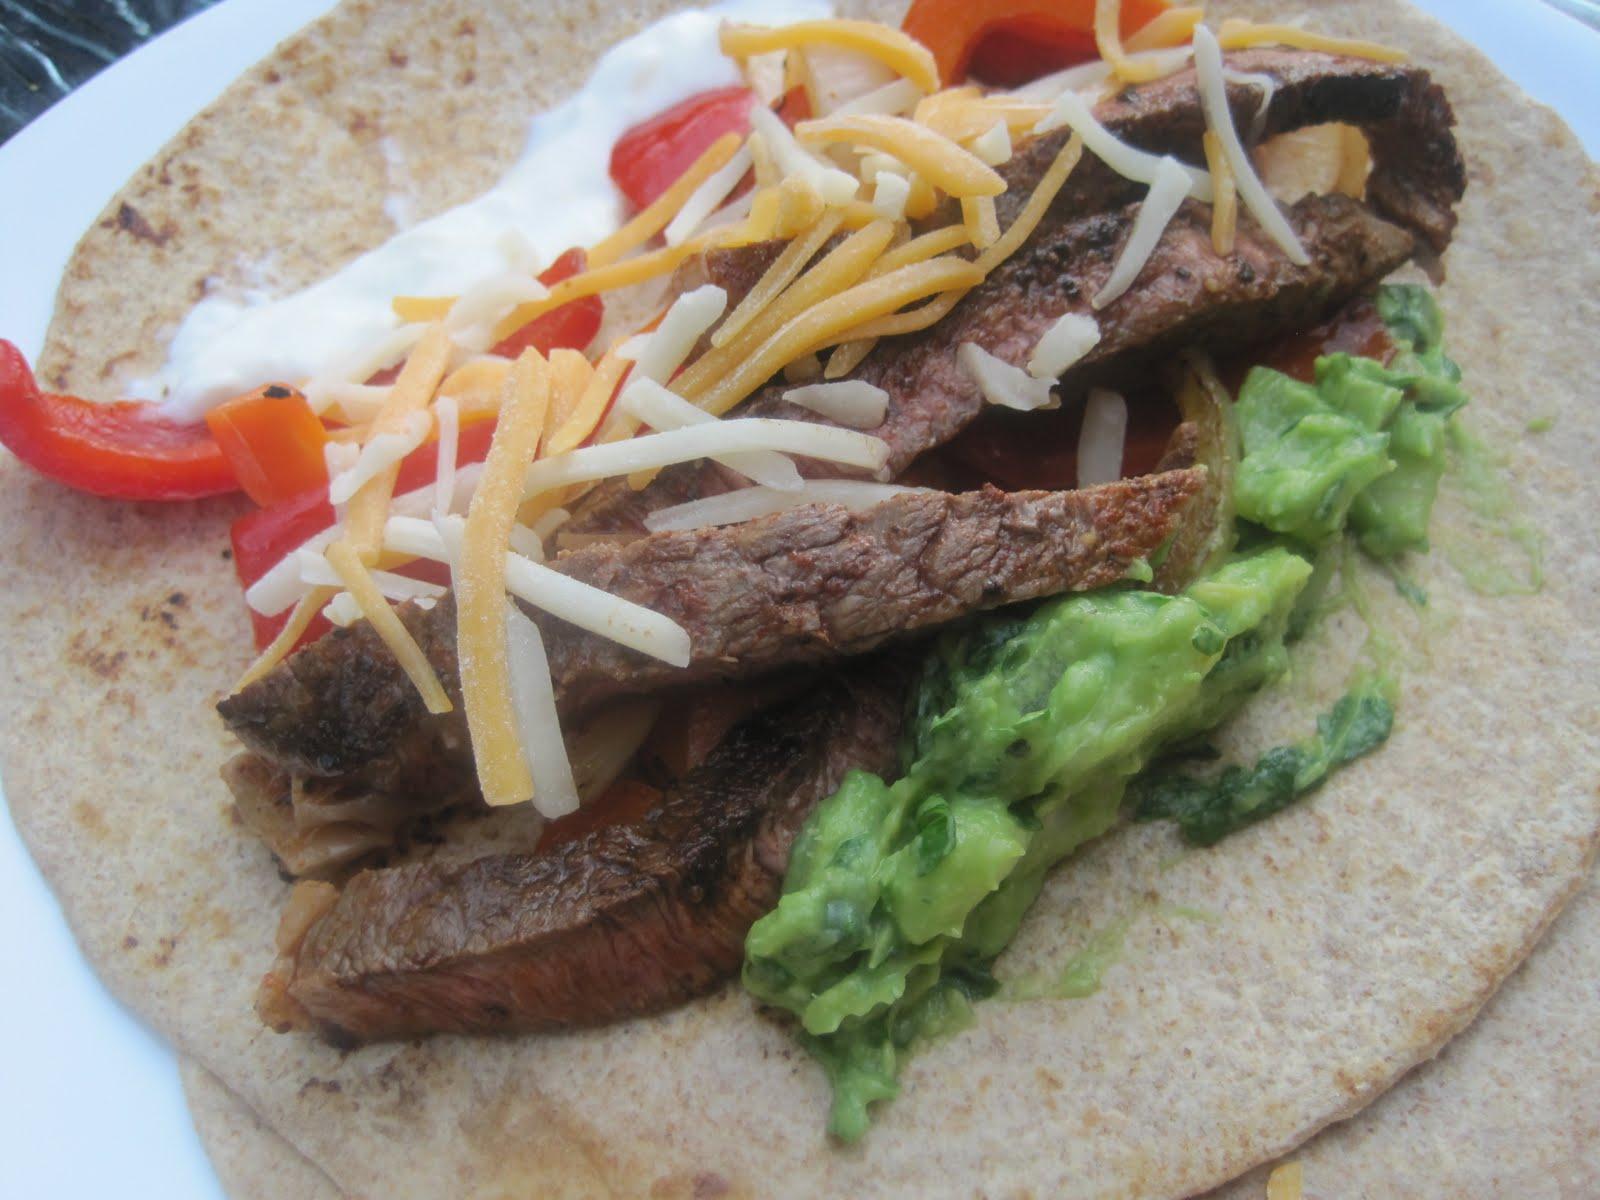 Corcoran Street Kitchen: Lime Marinated Steak Fajitas